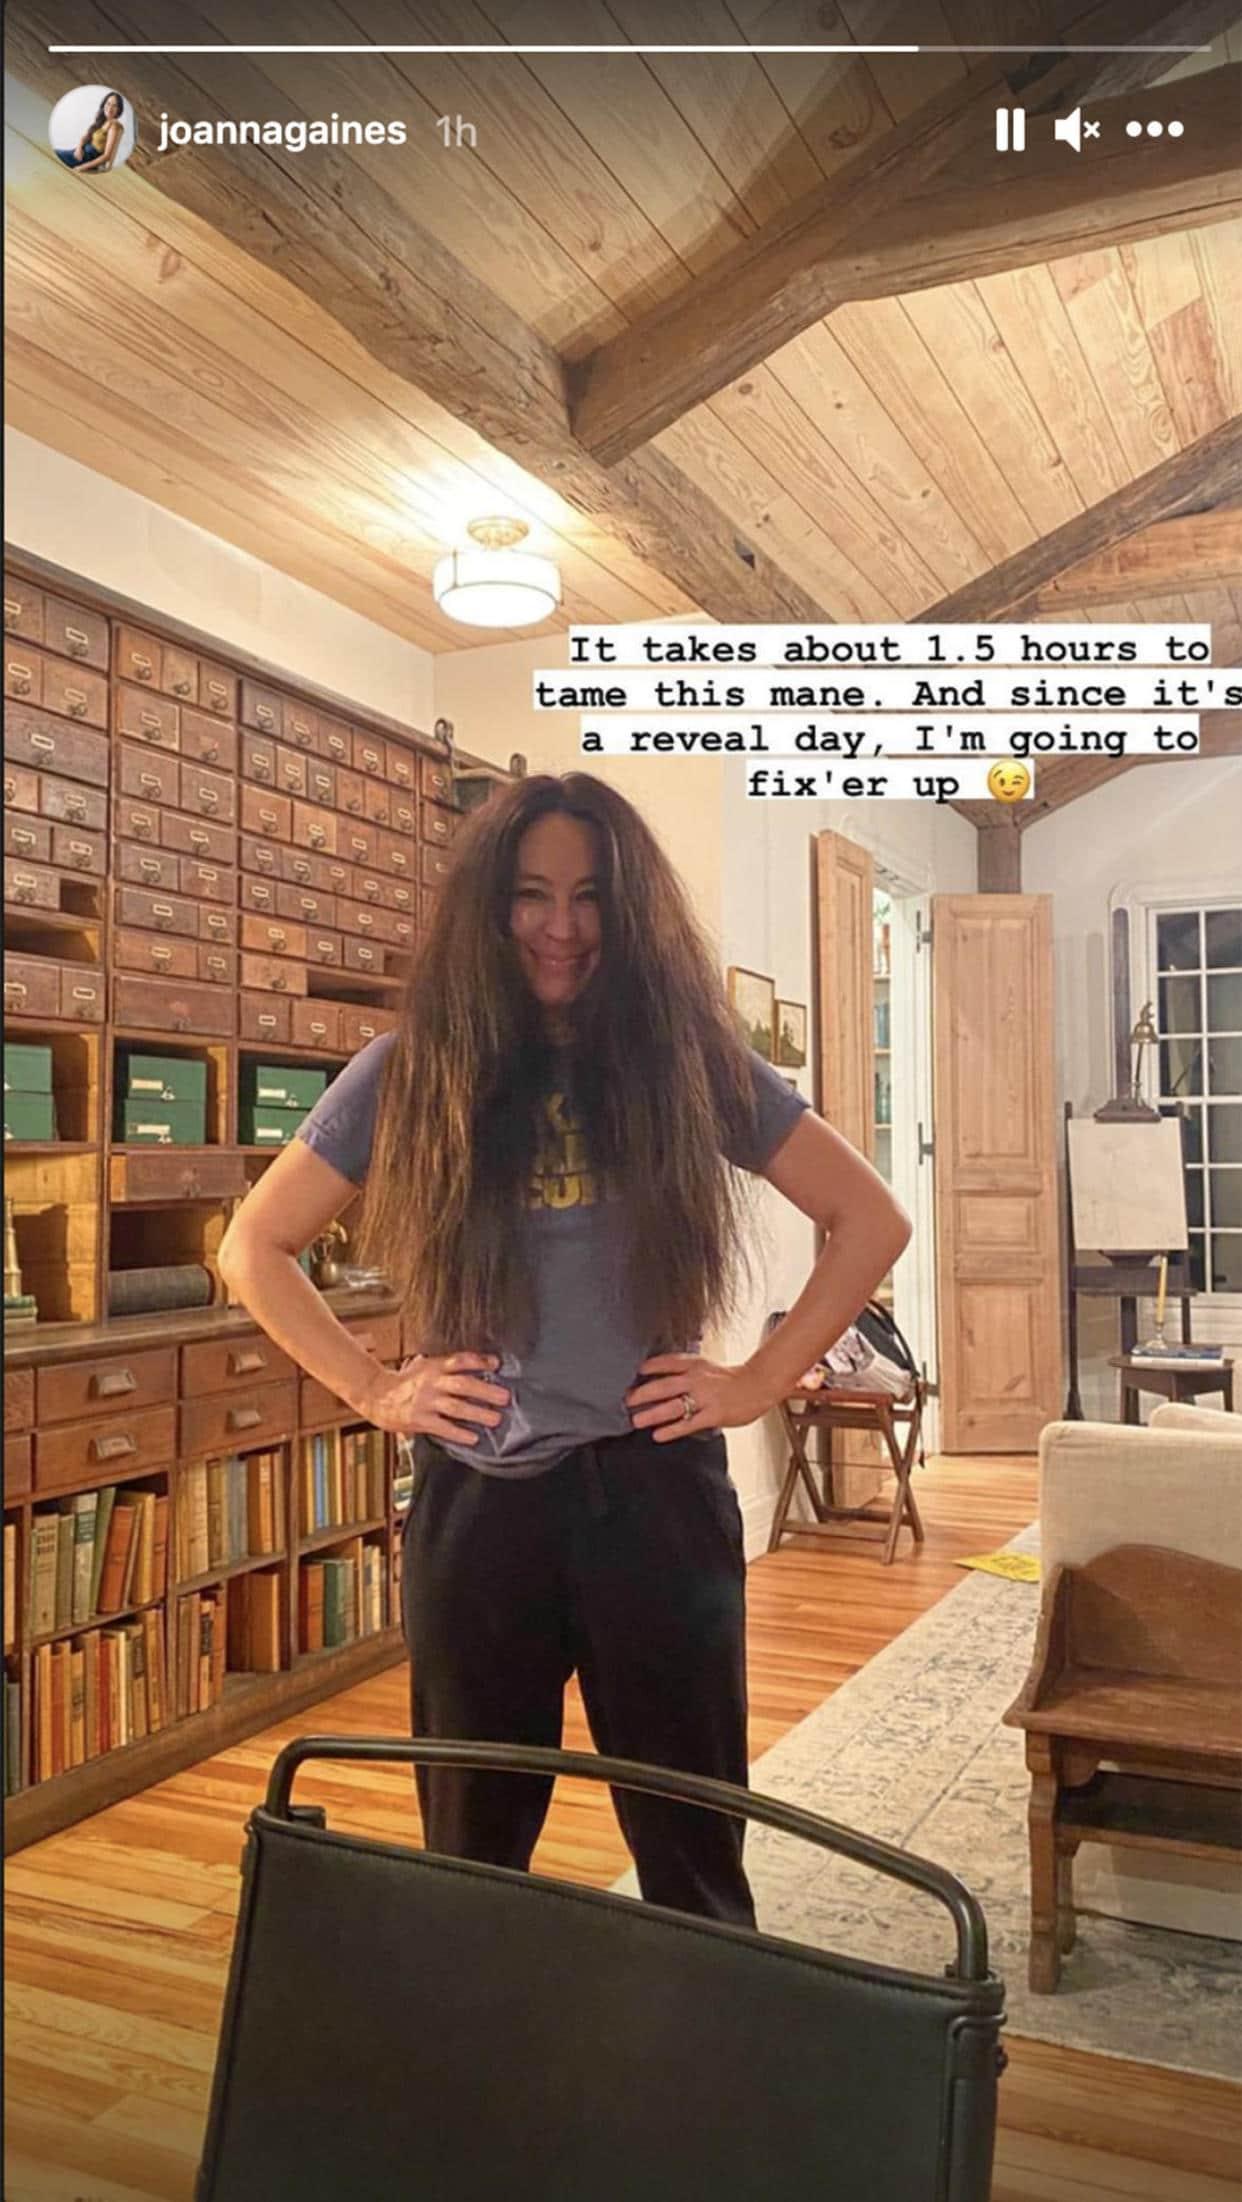 joanna gaines natural hair fixer upper